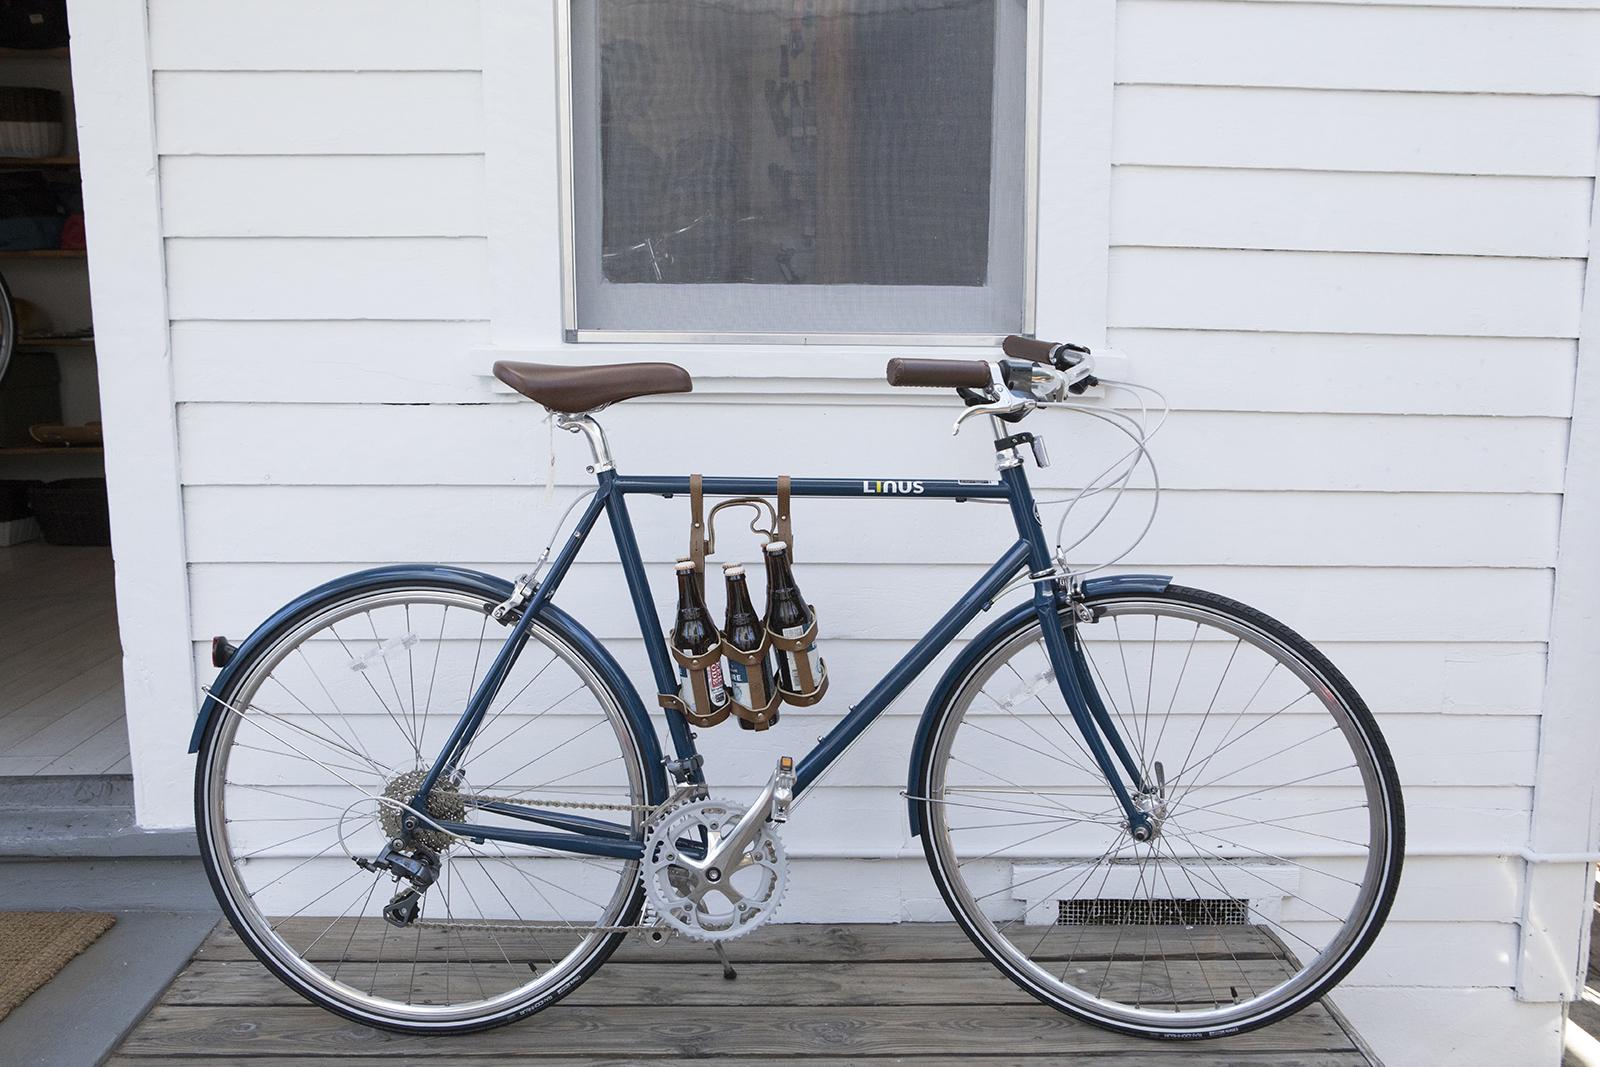 linusbikes-137-1600px